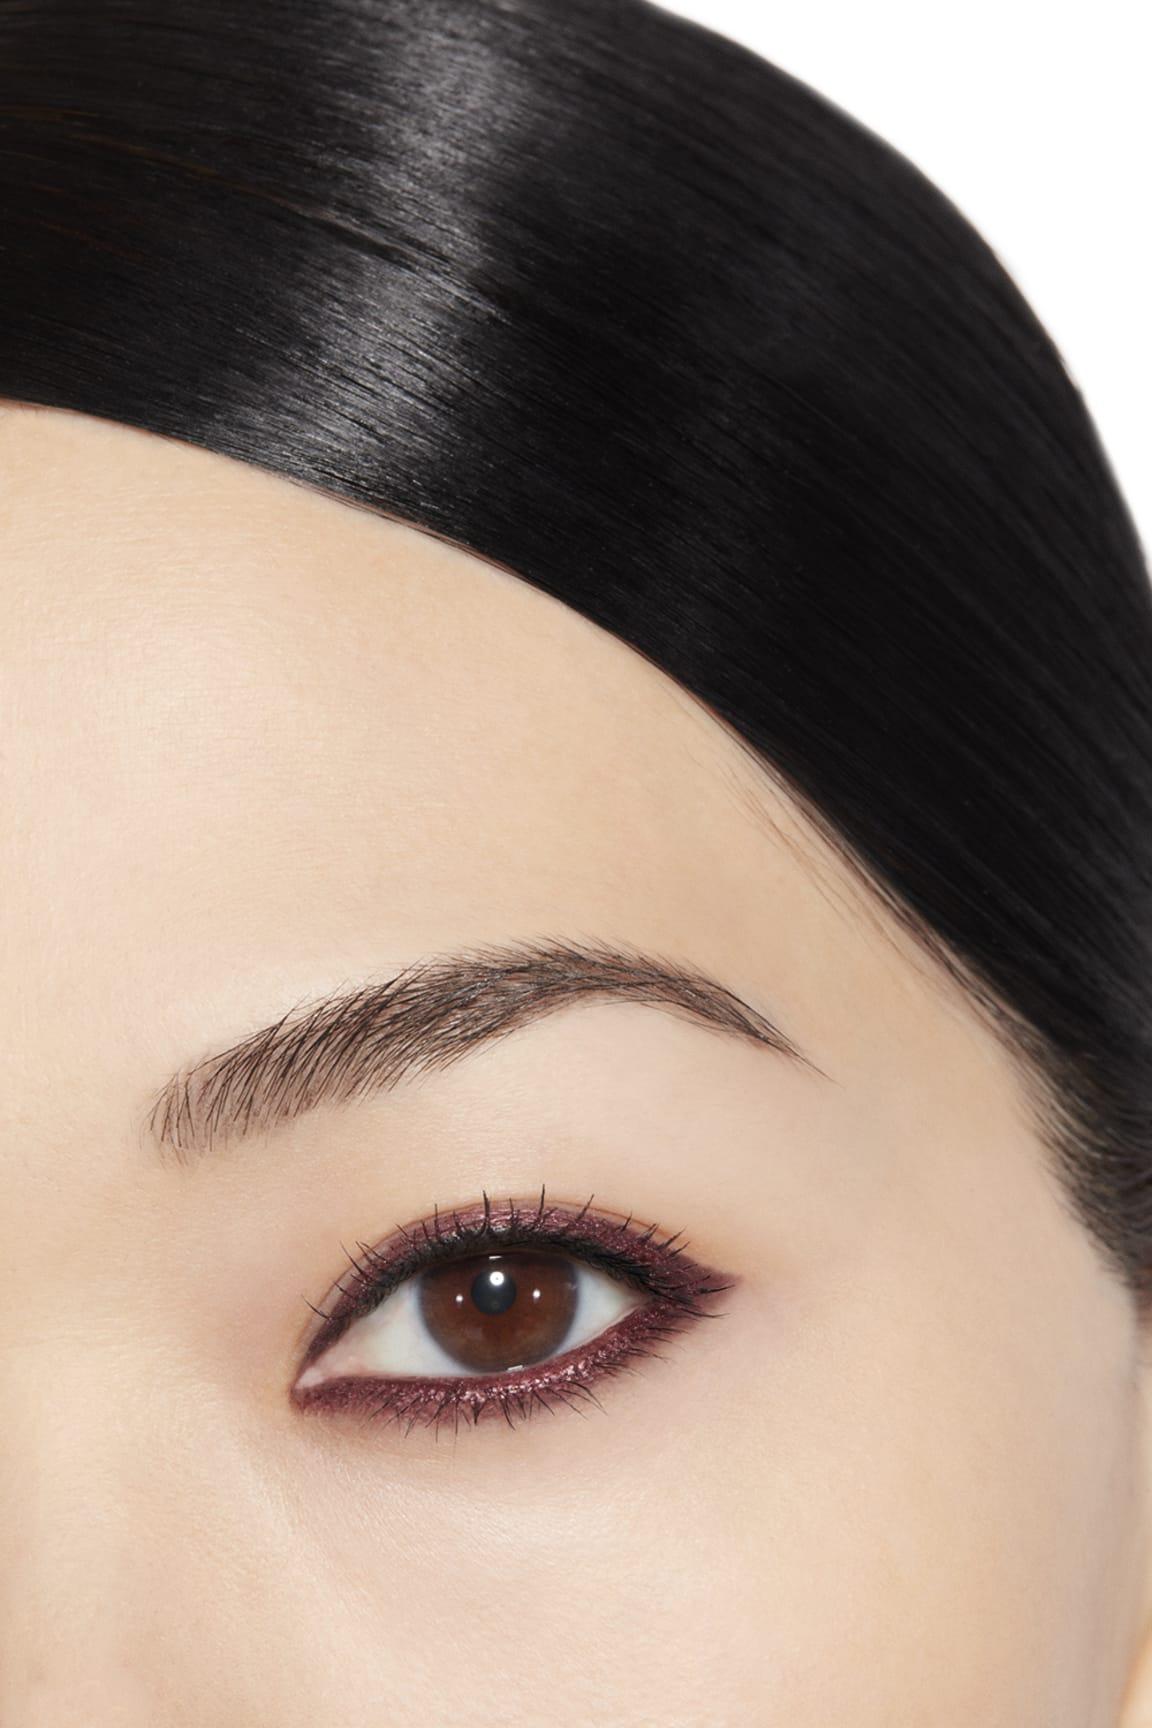 Anwendung Make-up-Bild 1 - STYLO YEUX WATERPROOF 54 - ROSE CUIVRÉ